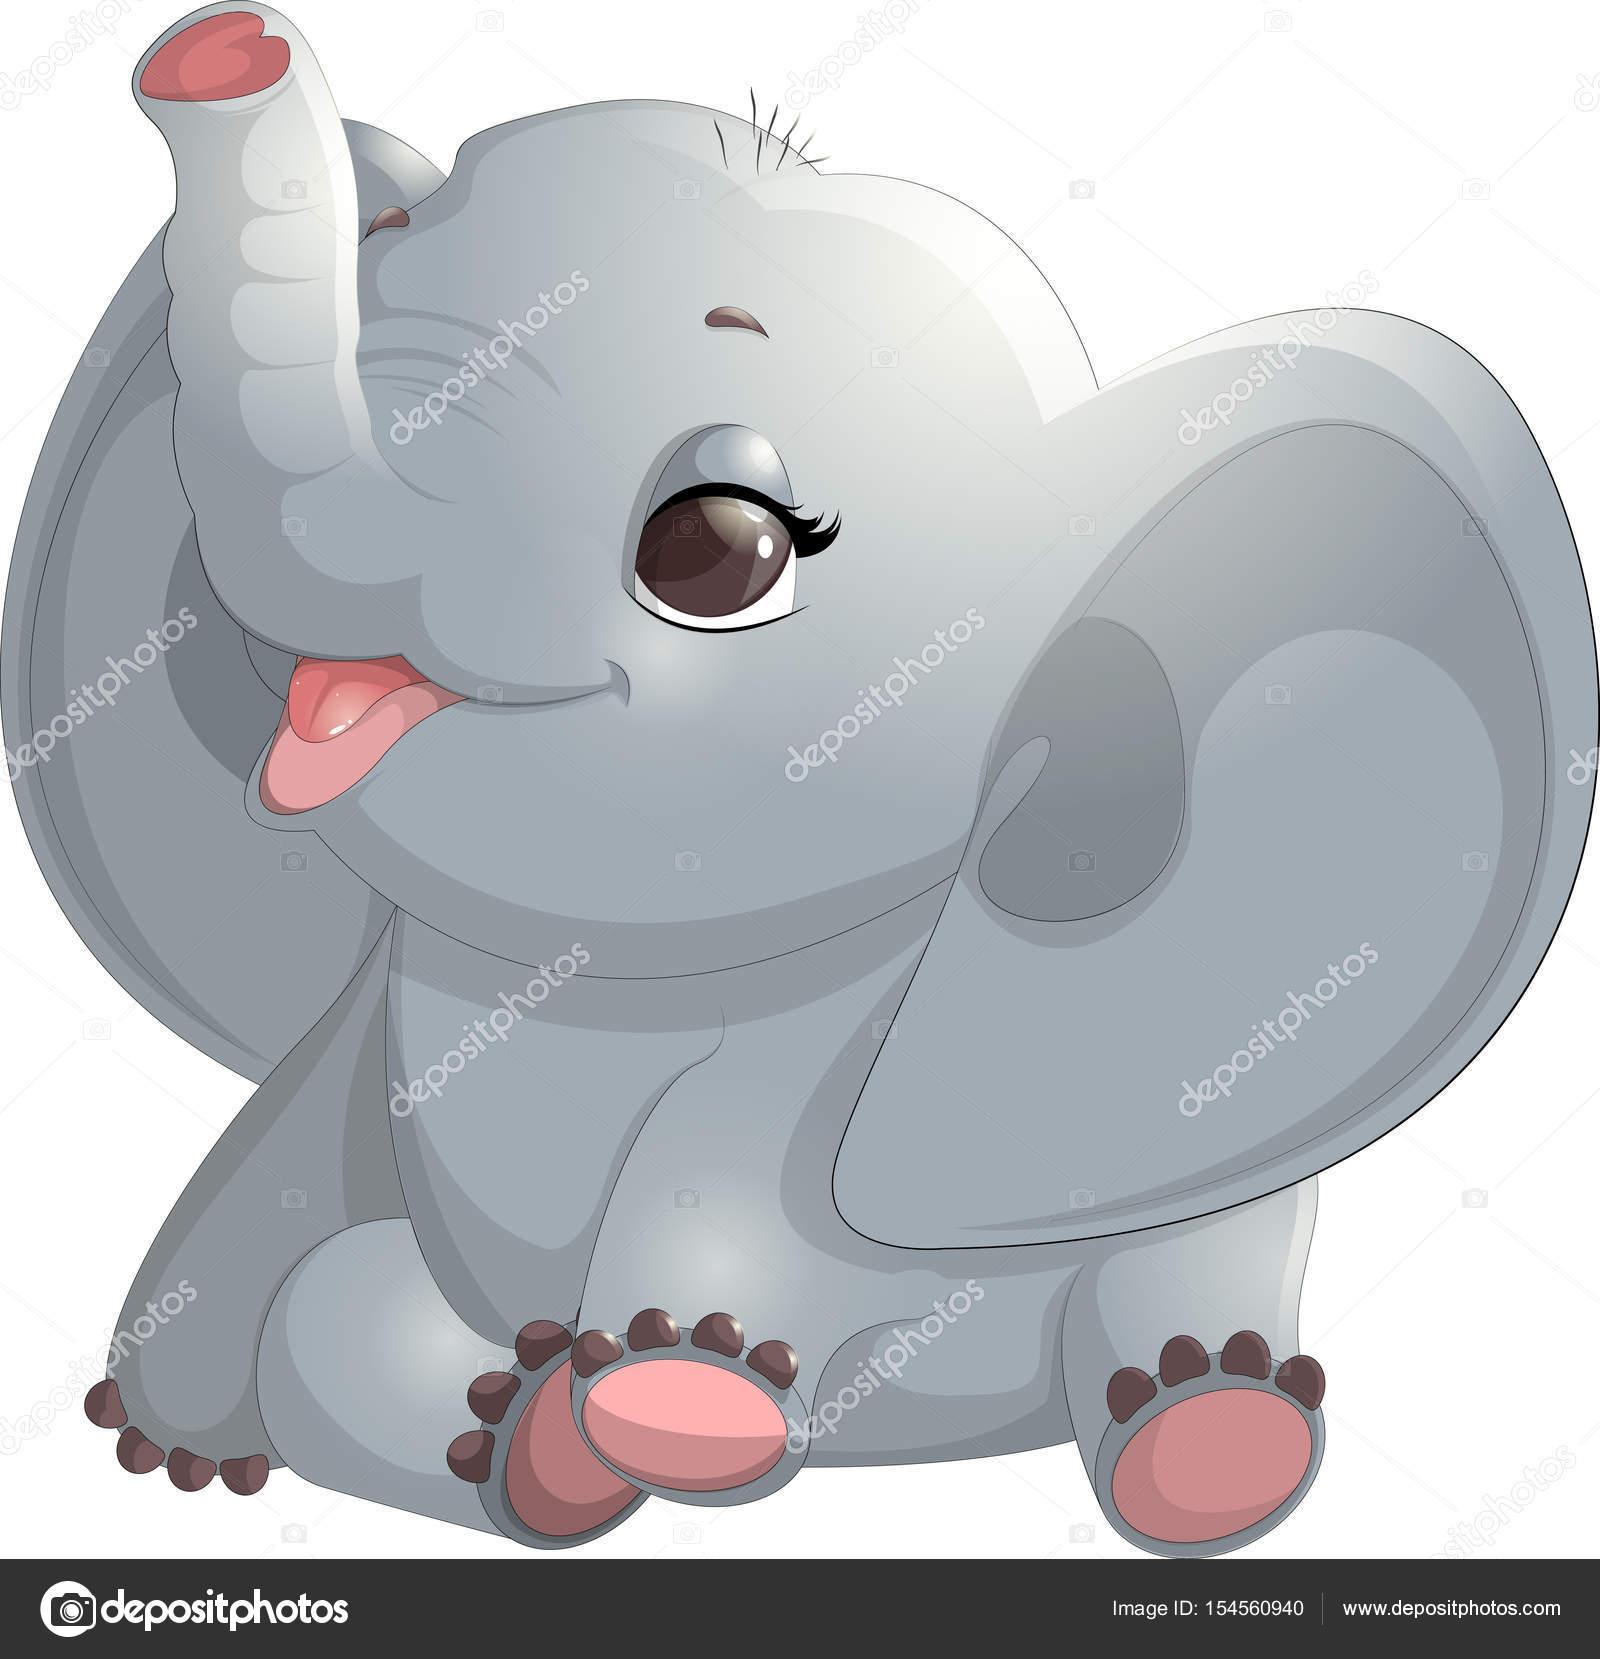 Fonkelnieuw Schönen niedlichen Elefanten — Stockvektor © andryuha19811 #154560940 PC-45